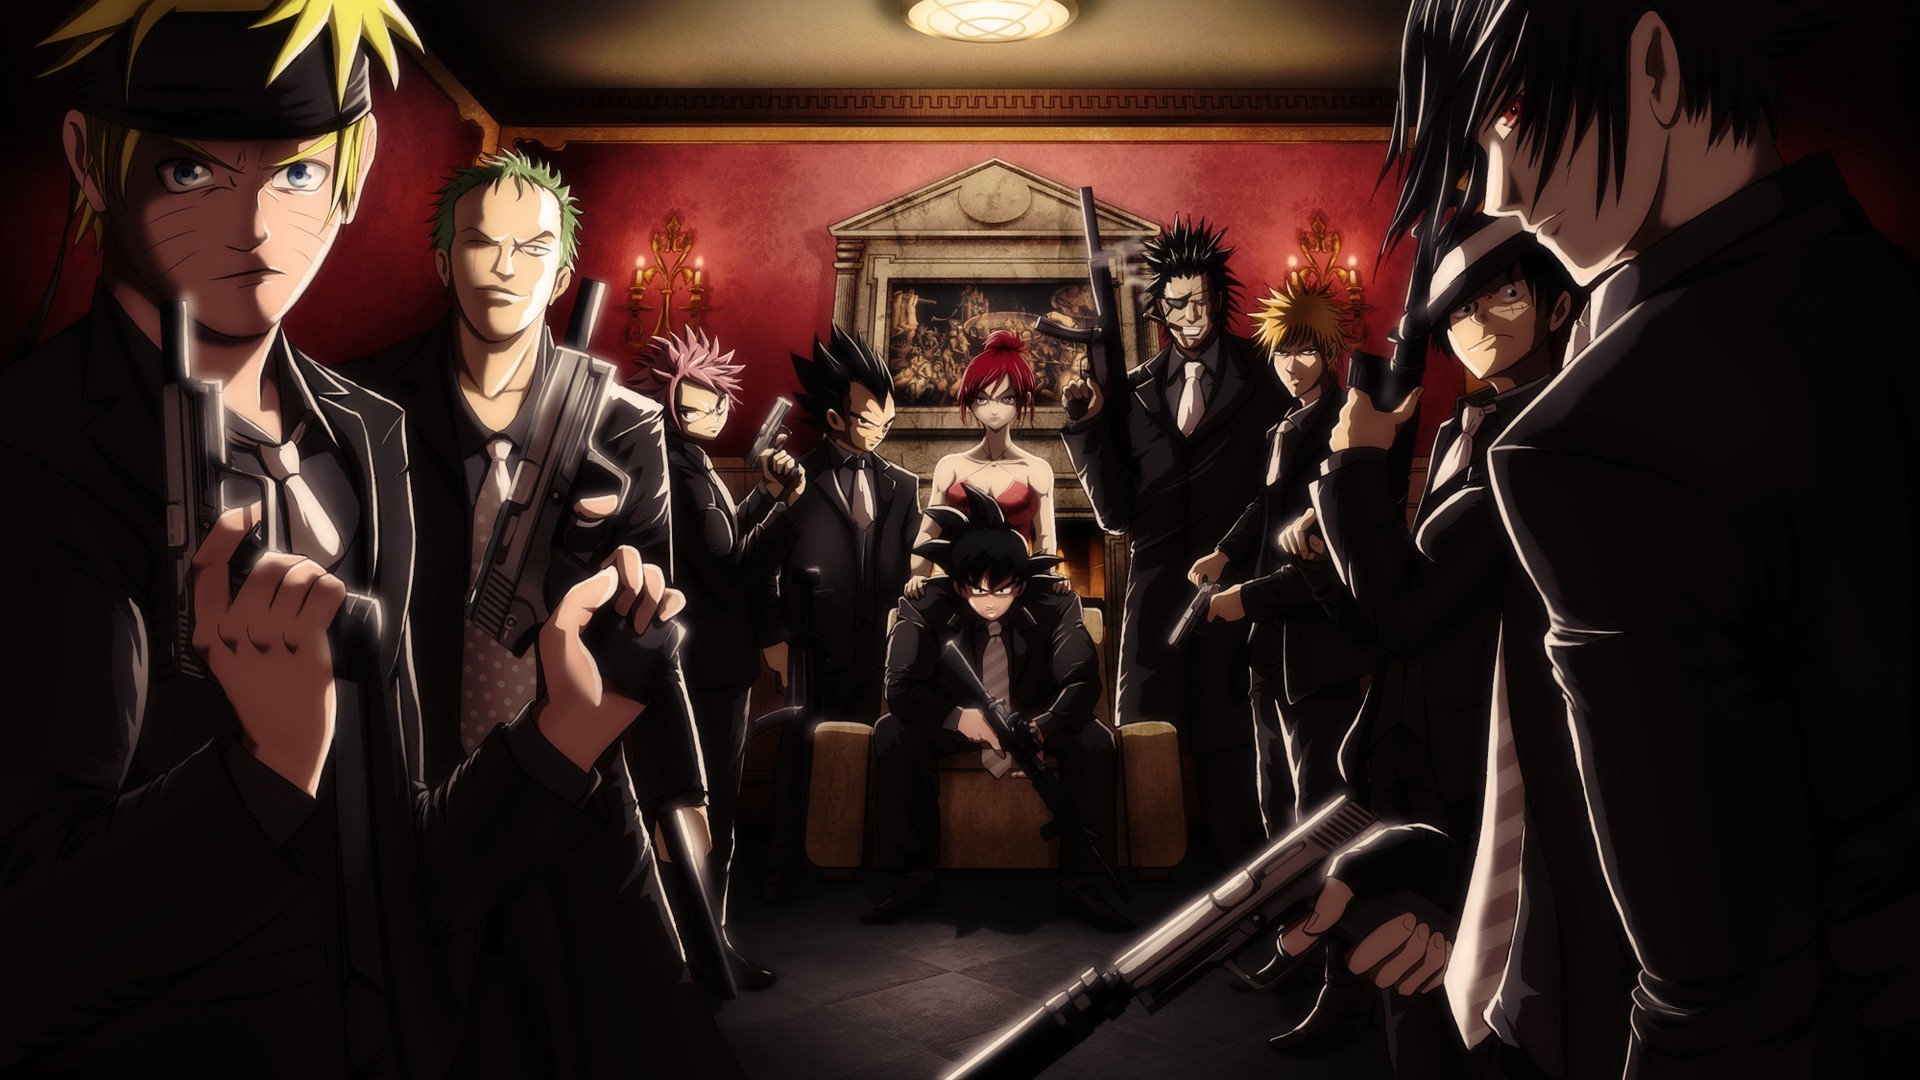 All Anime Characters HD Wallpaper - WallpaperSafari